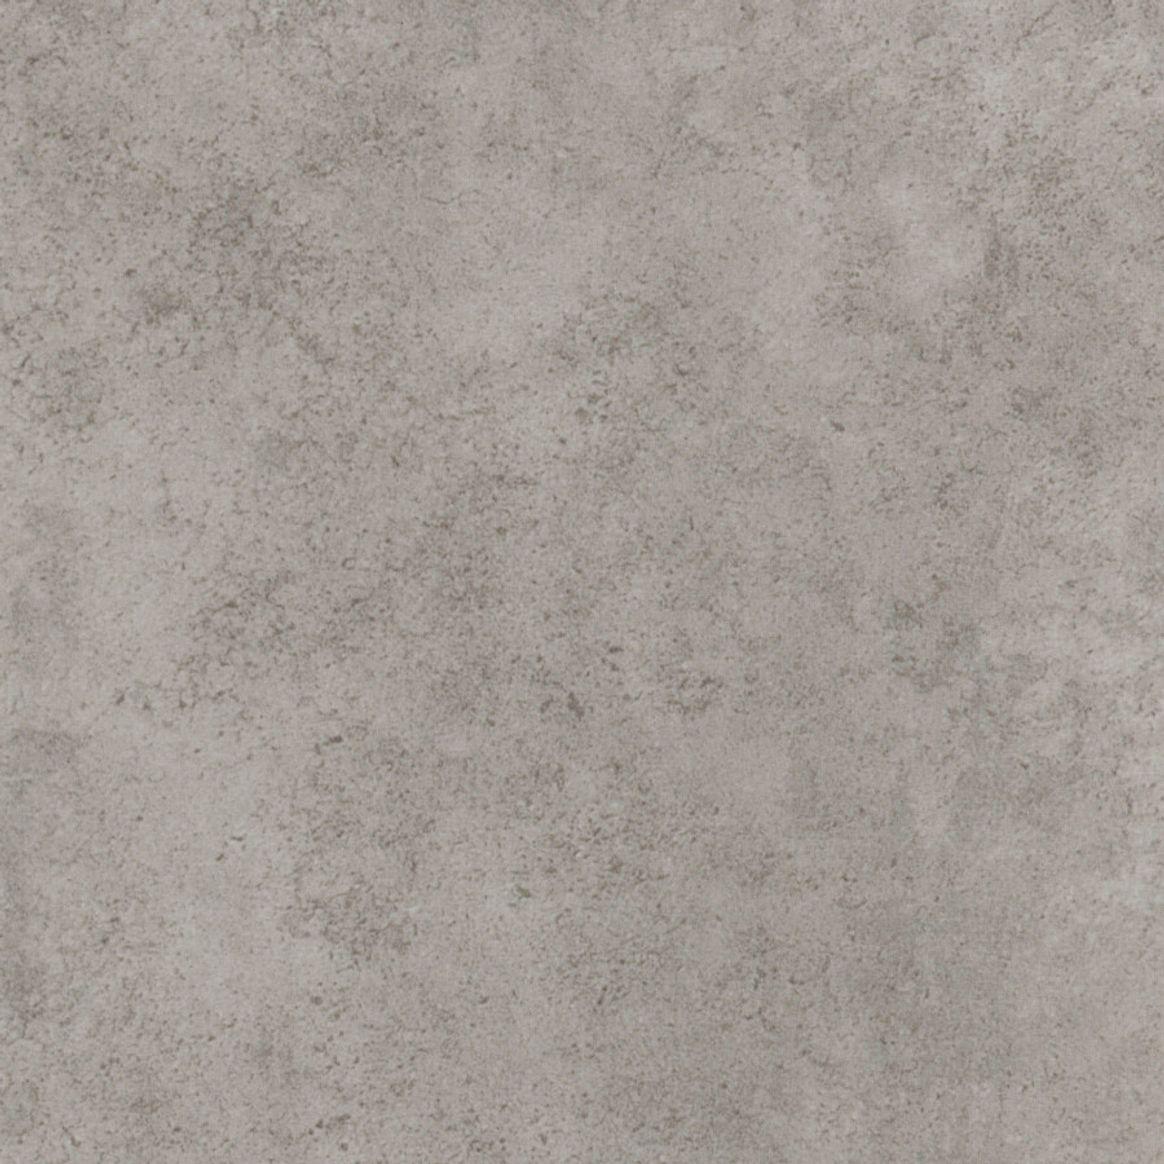 Gallery Concrete tile